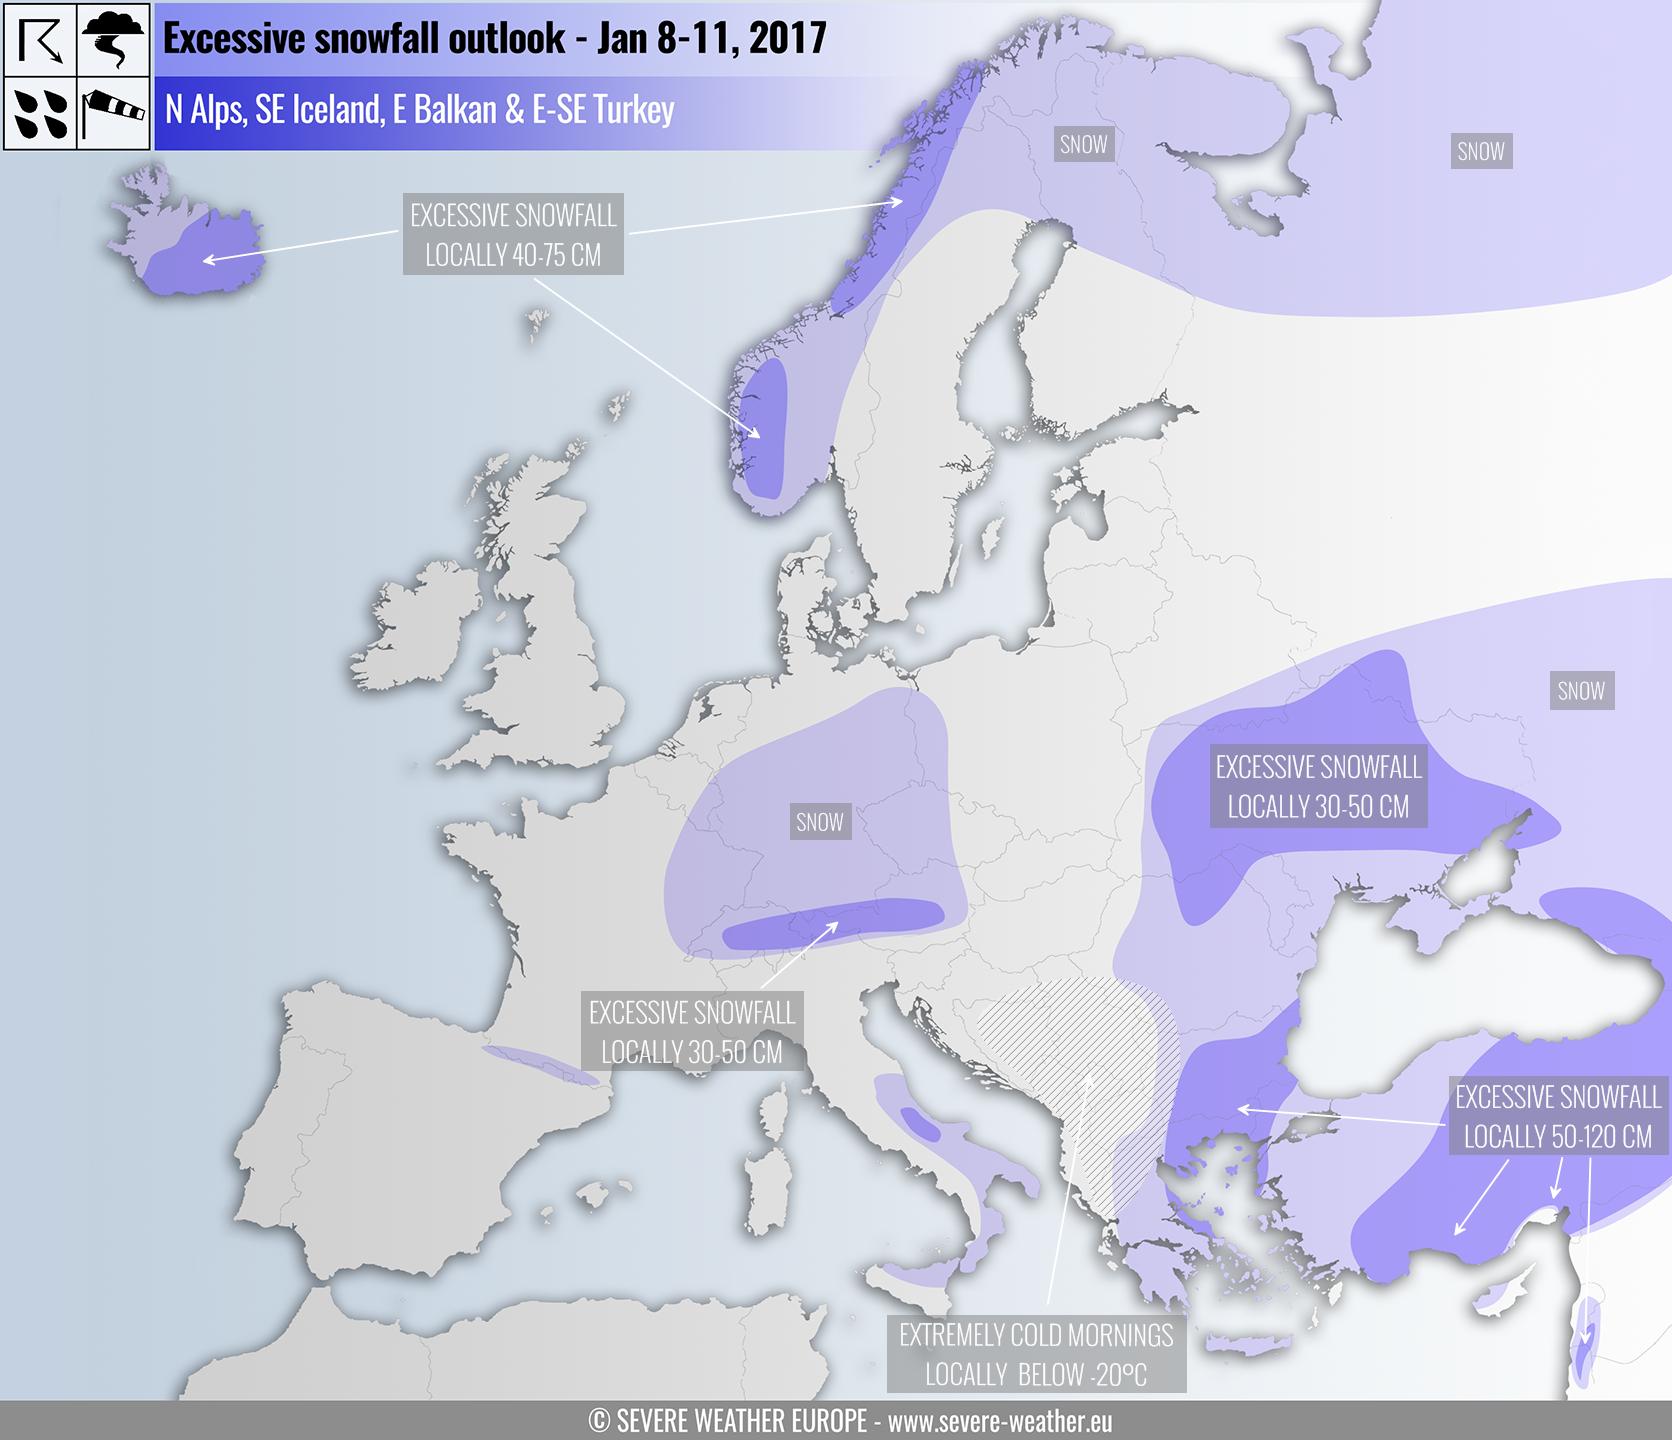 Snow Map Europe.Excessive Snowfall Outlook Across Europe Jan 8 11 2017 Severe